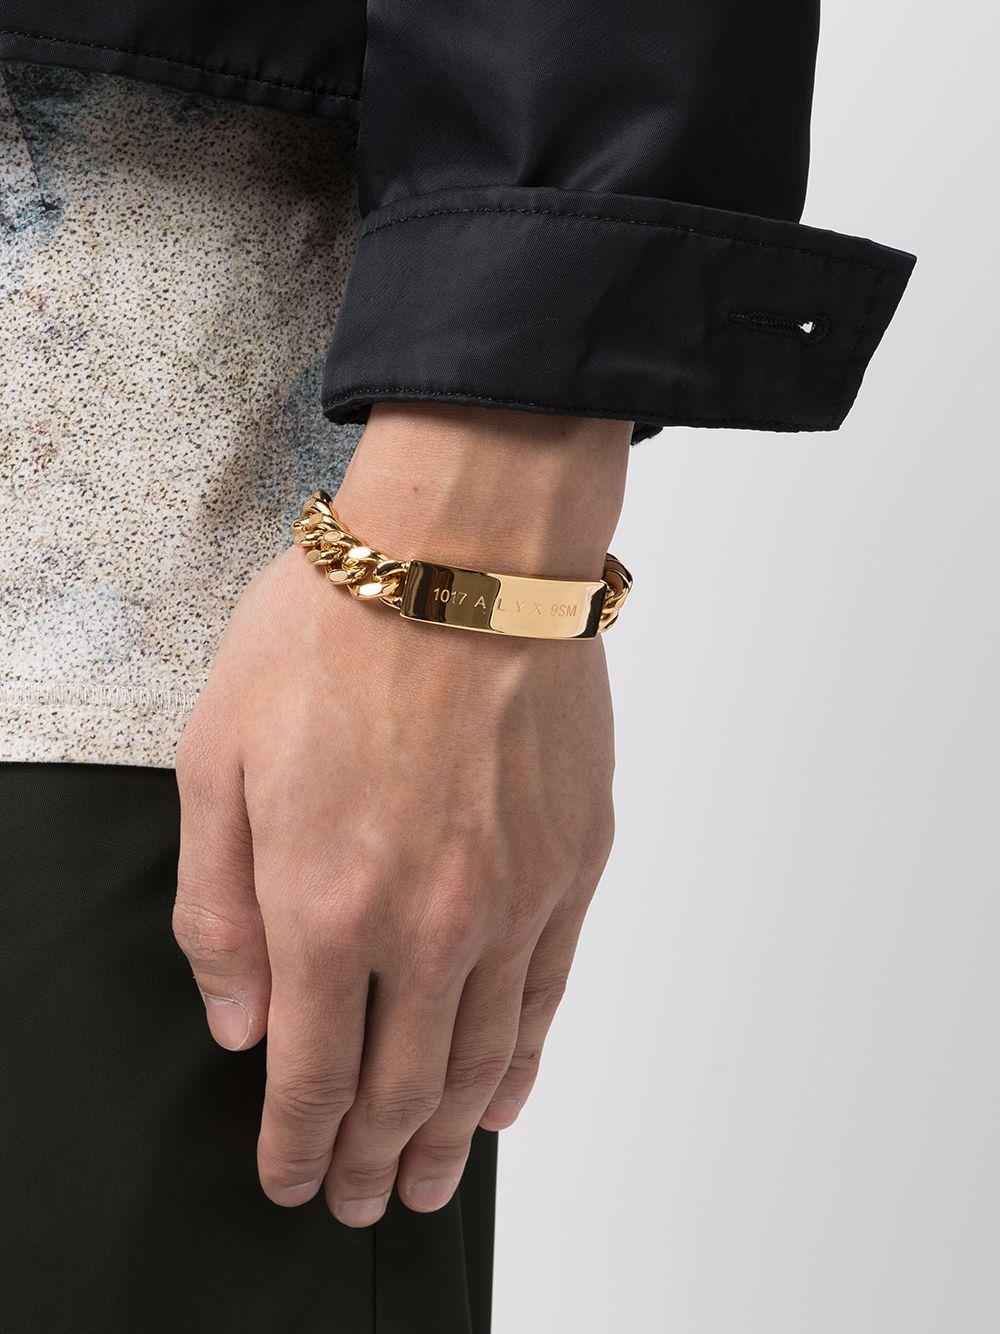 logo bracelet man gold 1017 ALYX 9SM | Jewellery | AAUJW0119OT01GLD0003